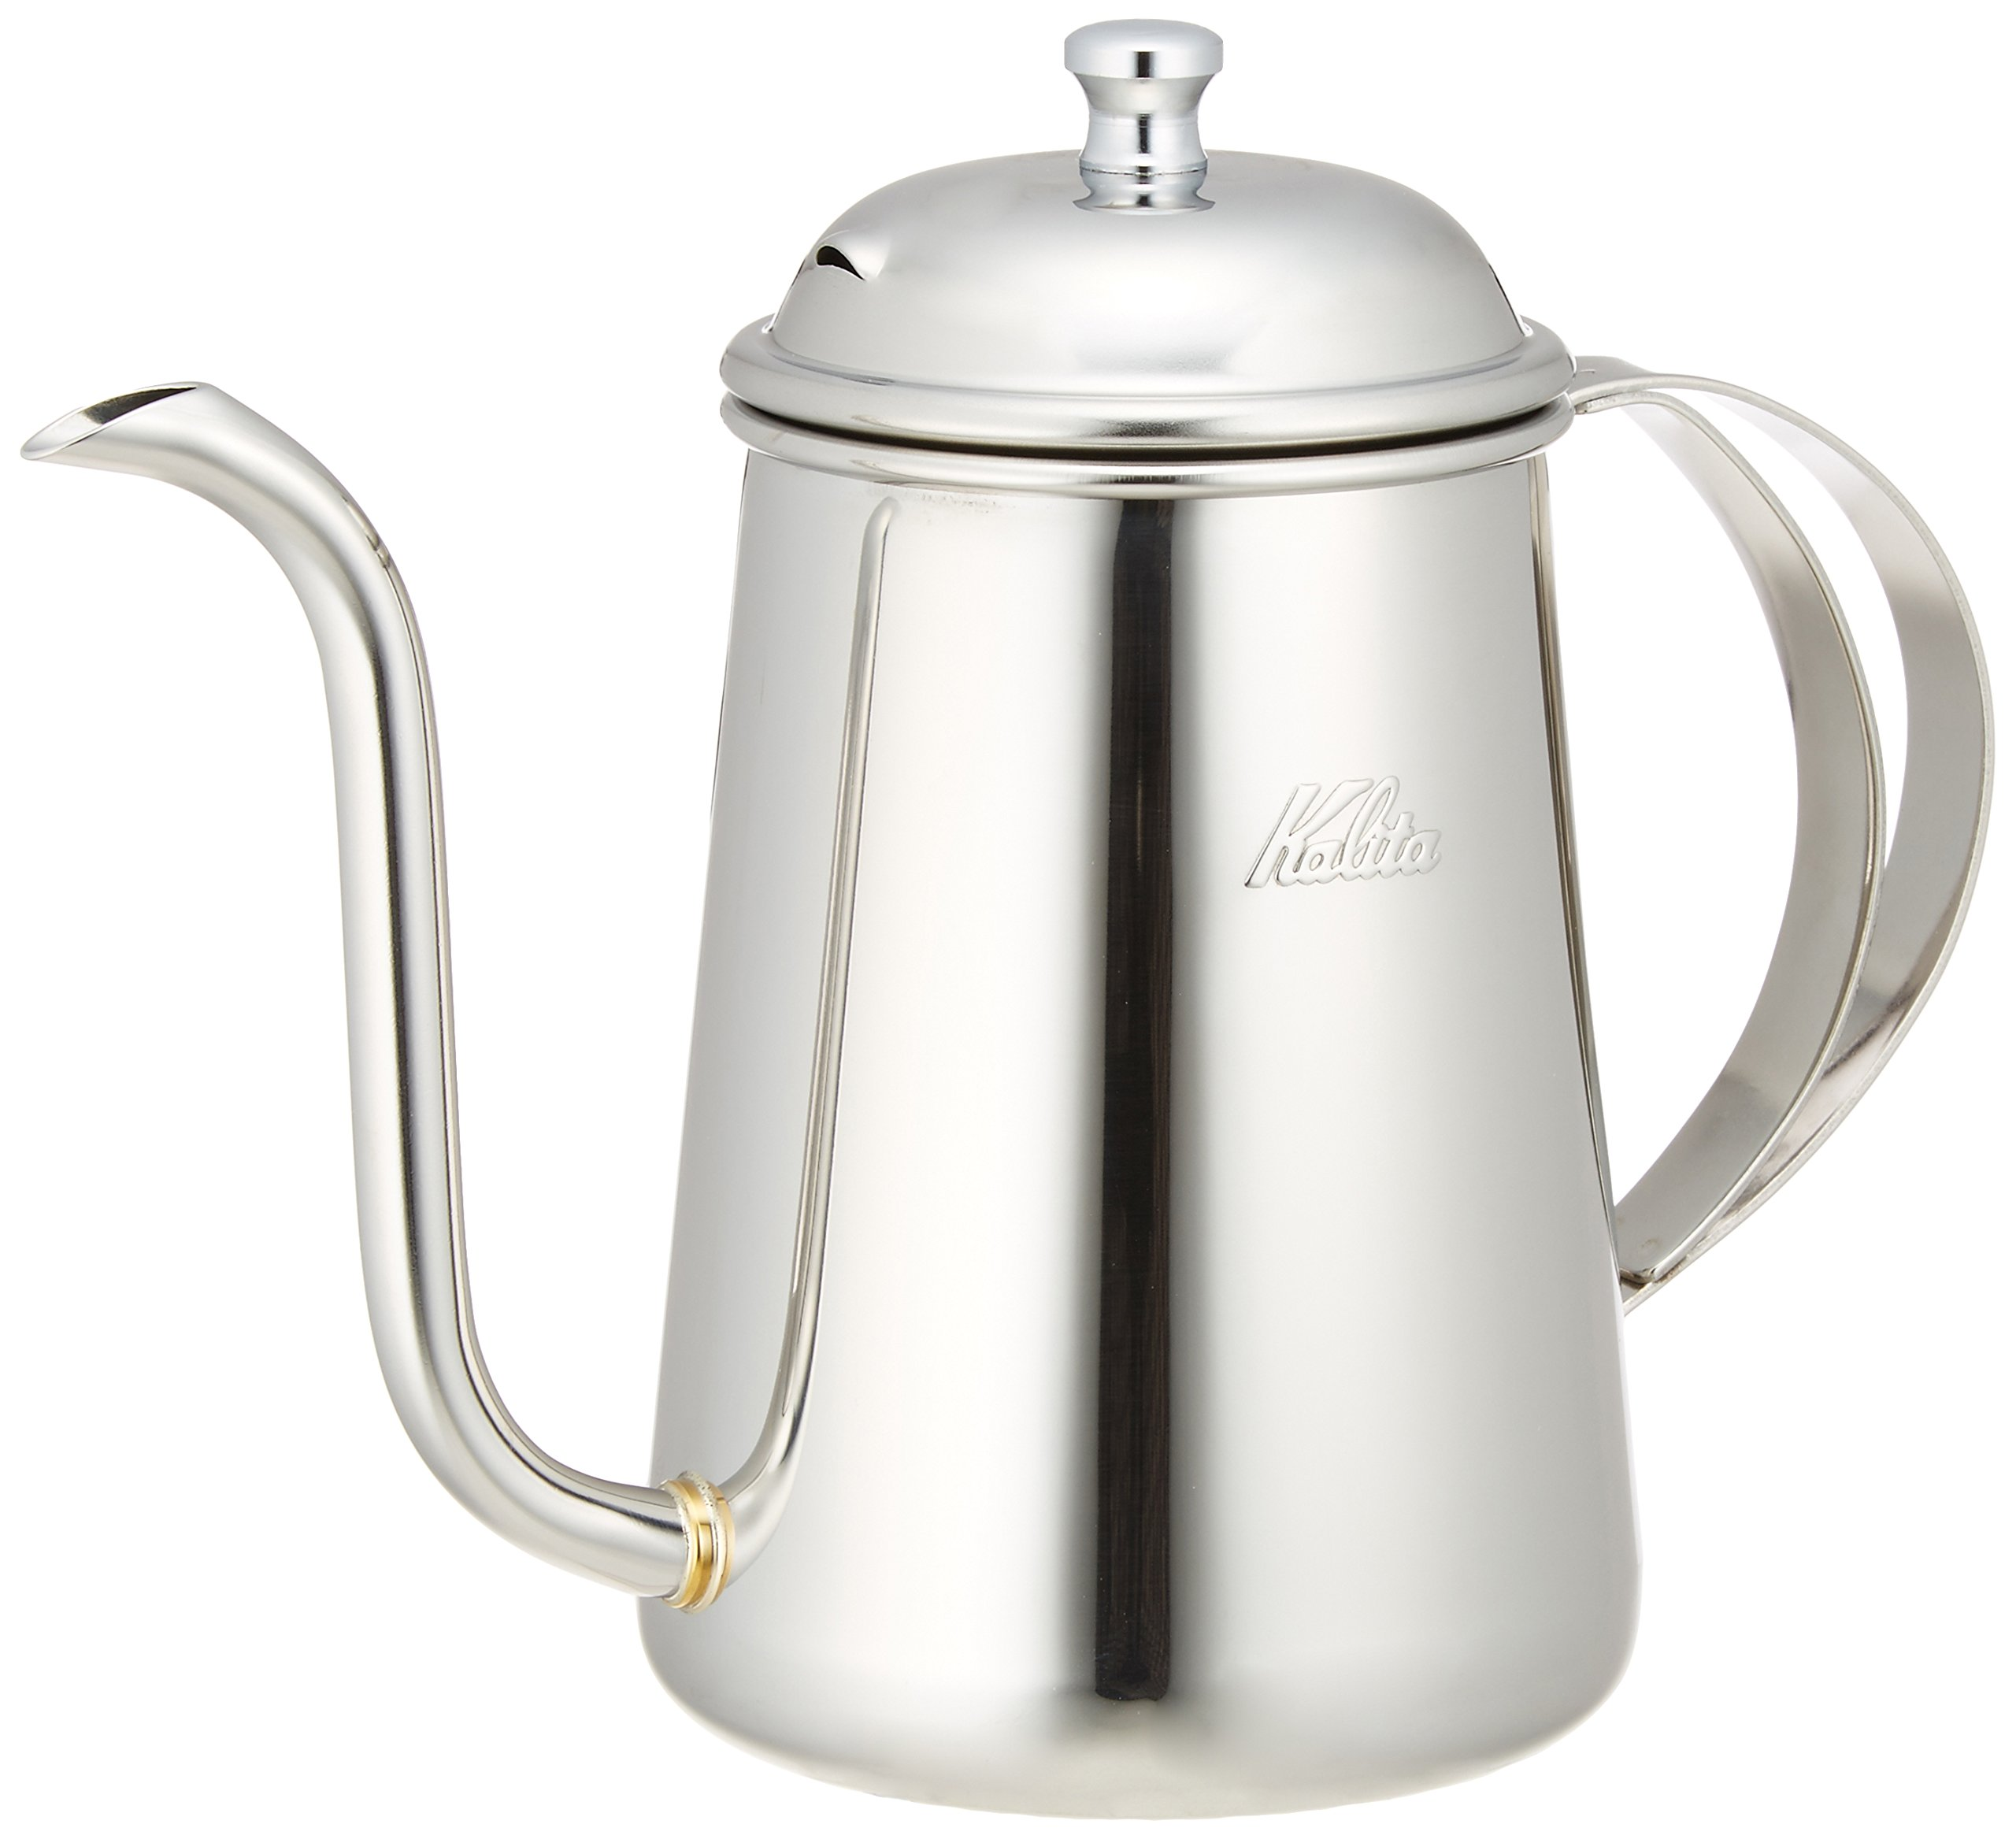 Kalitas Stylish Stainless Pot (0.7L)